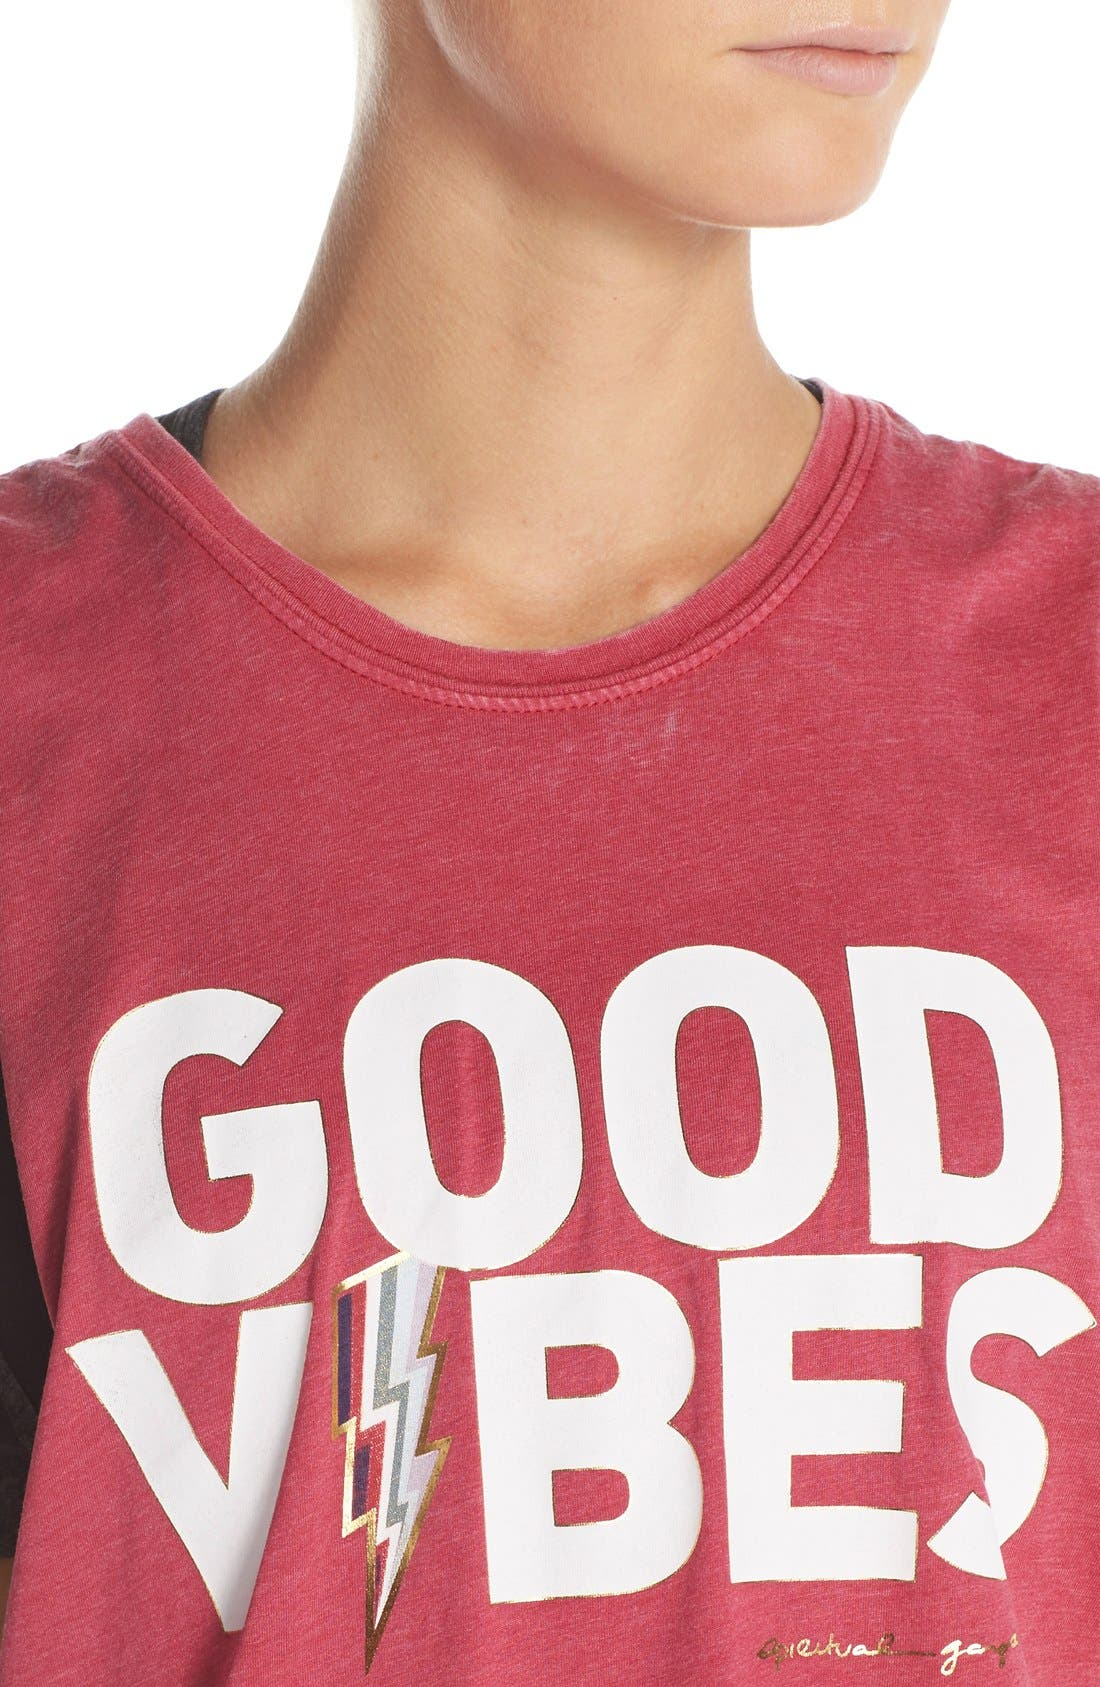 'Good Vibes' Muscle Tank,                             Alternate thumbnail 4, color,                             650